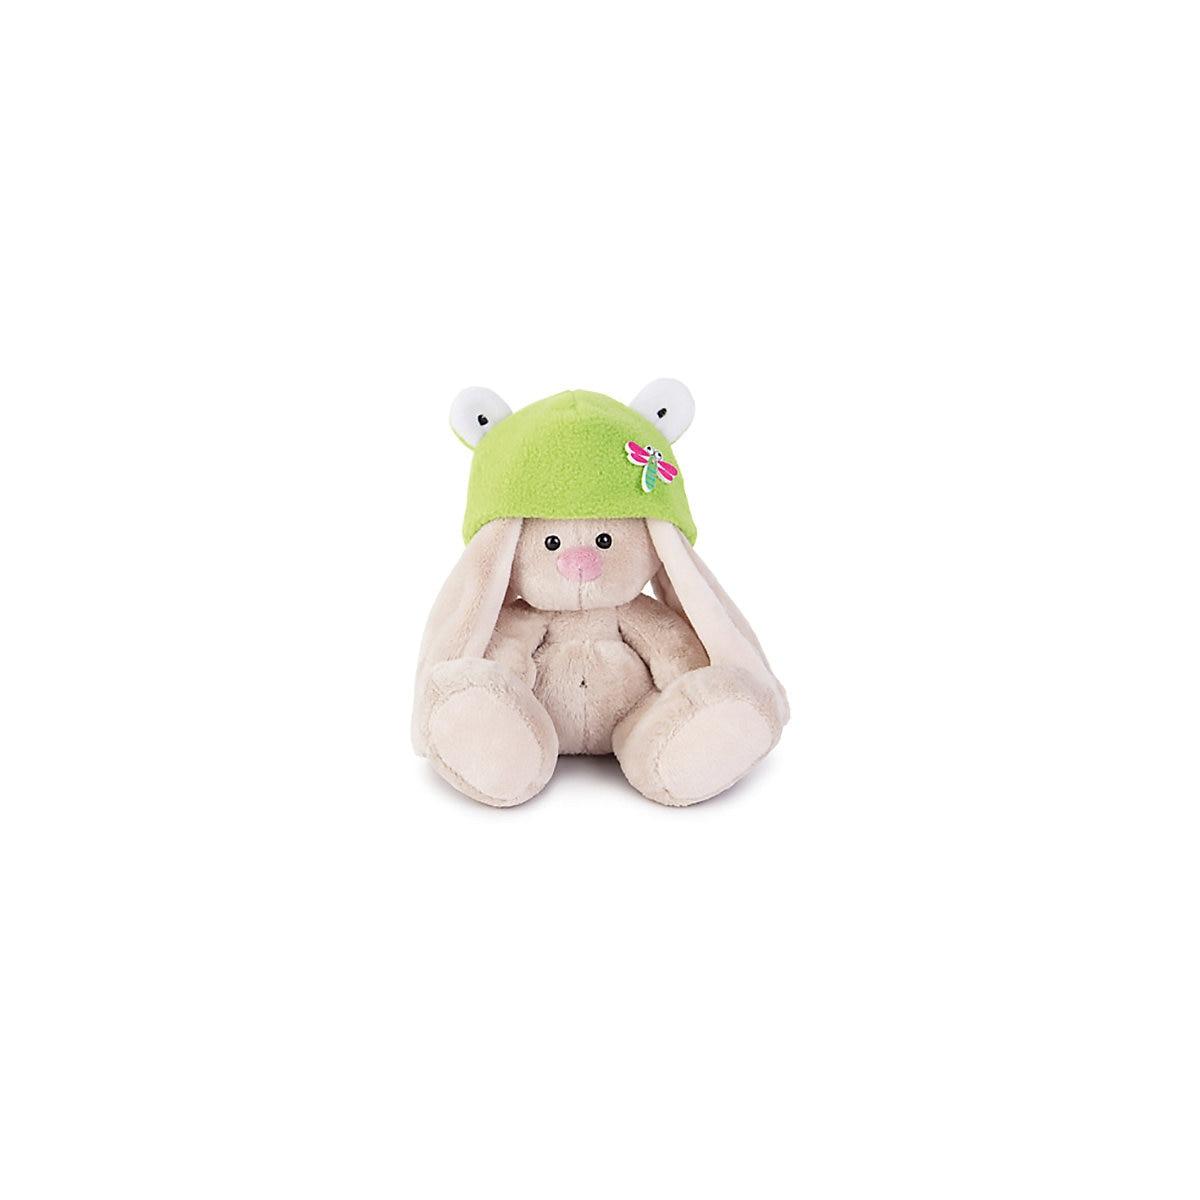 BUDI BASA Stuffed & Plush Animals 7417258 Rabbit Girls Soft Toy Friend Animal Play Game Toys MTpromo